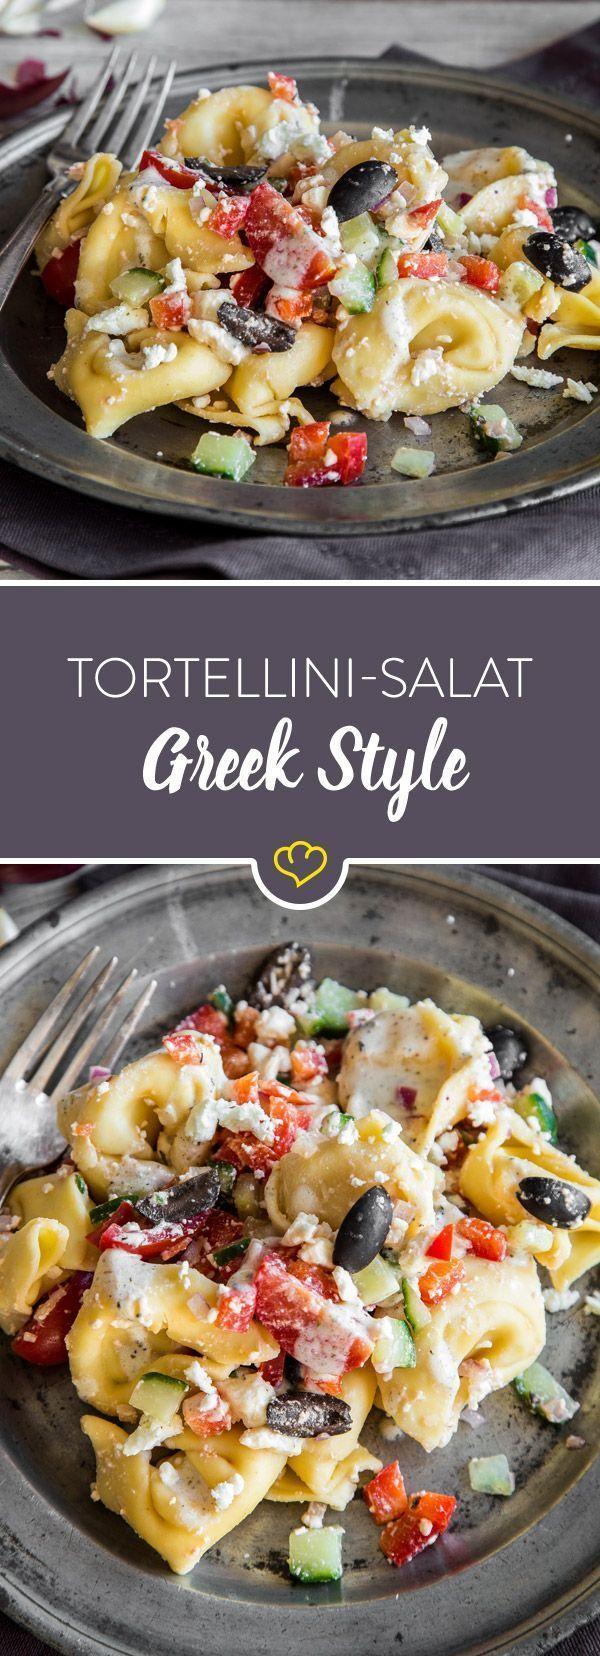 Photo of Italian-Greek tortellini salad with feta